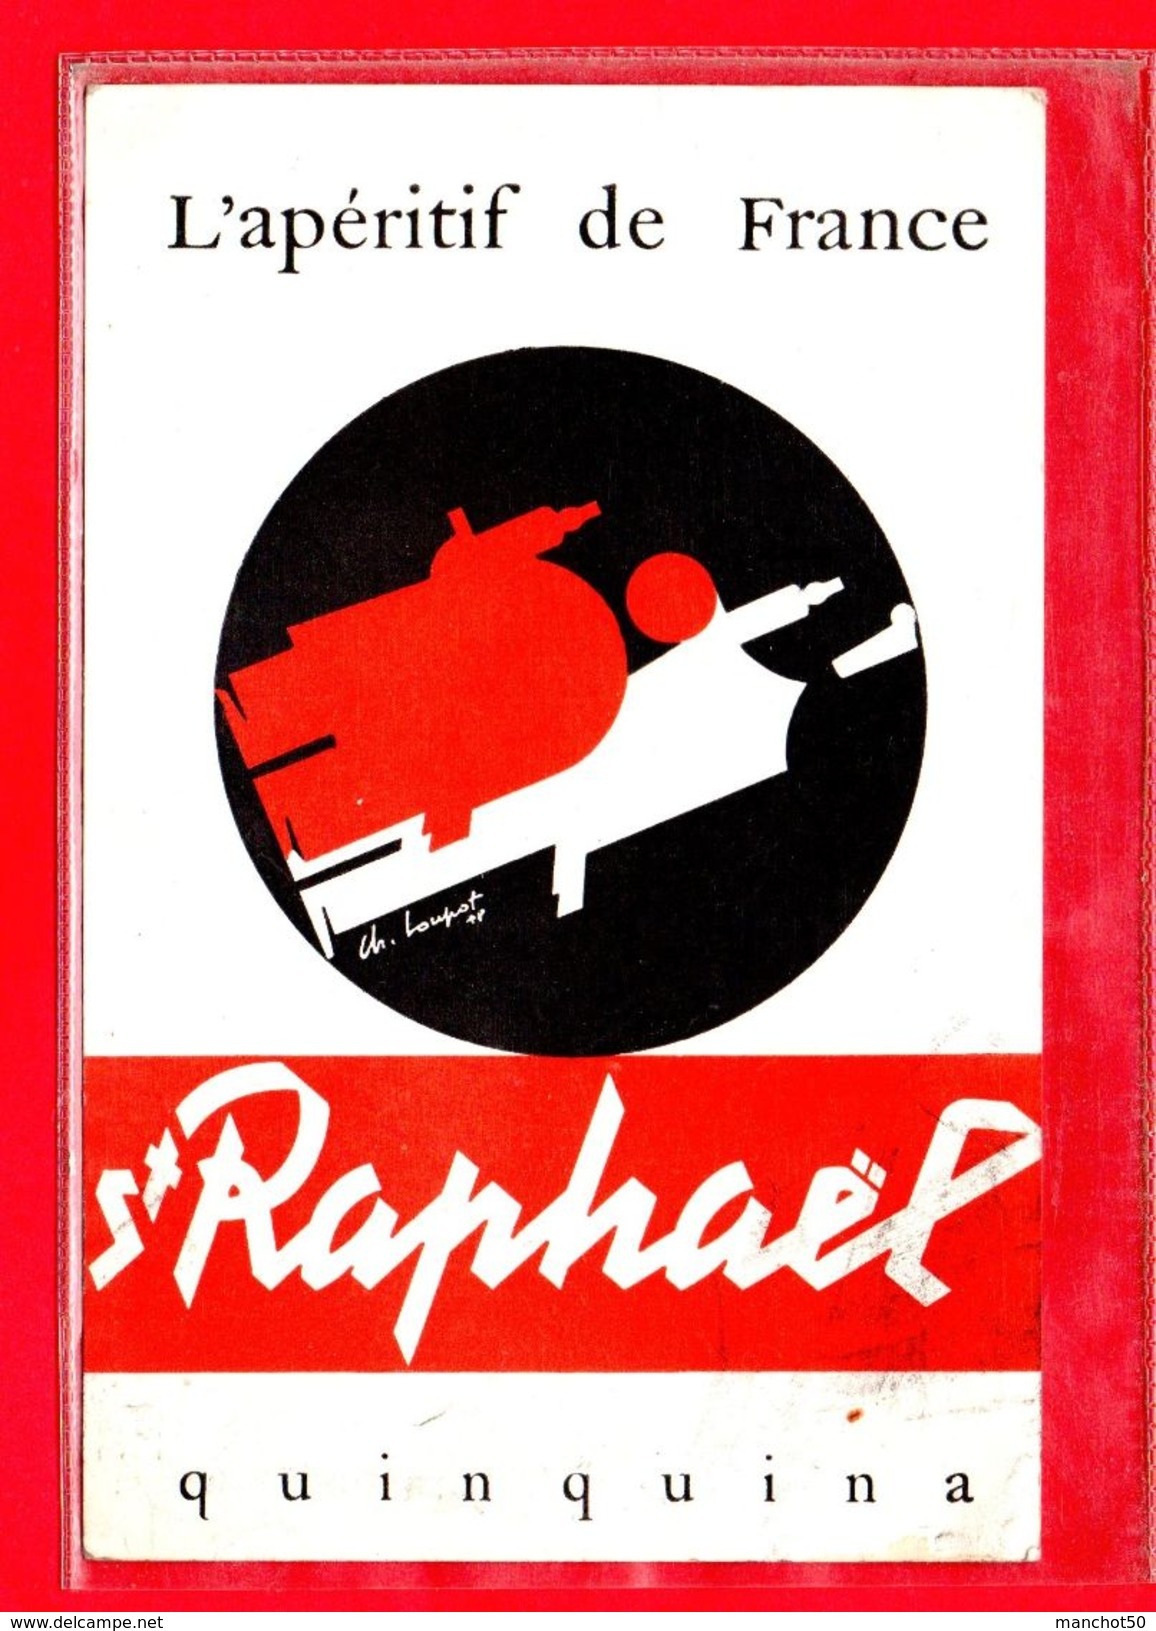 PUBLICITE-CPSM ST-RAPHAEL QUINQUINA - L'APERITIF DE FRANCE - Pubblicitari